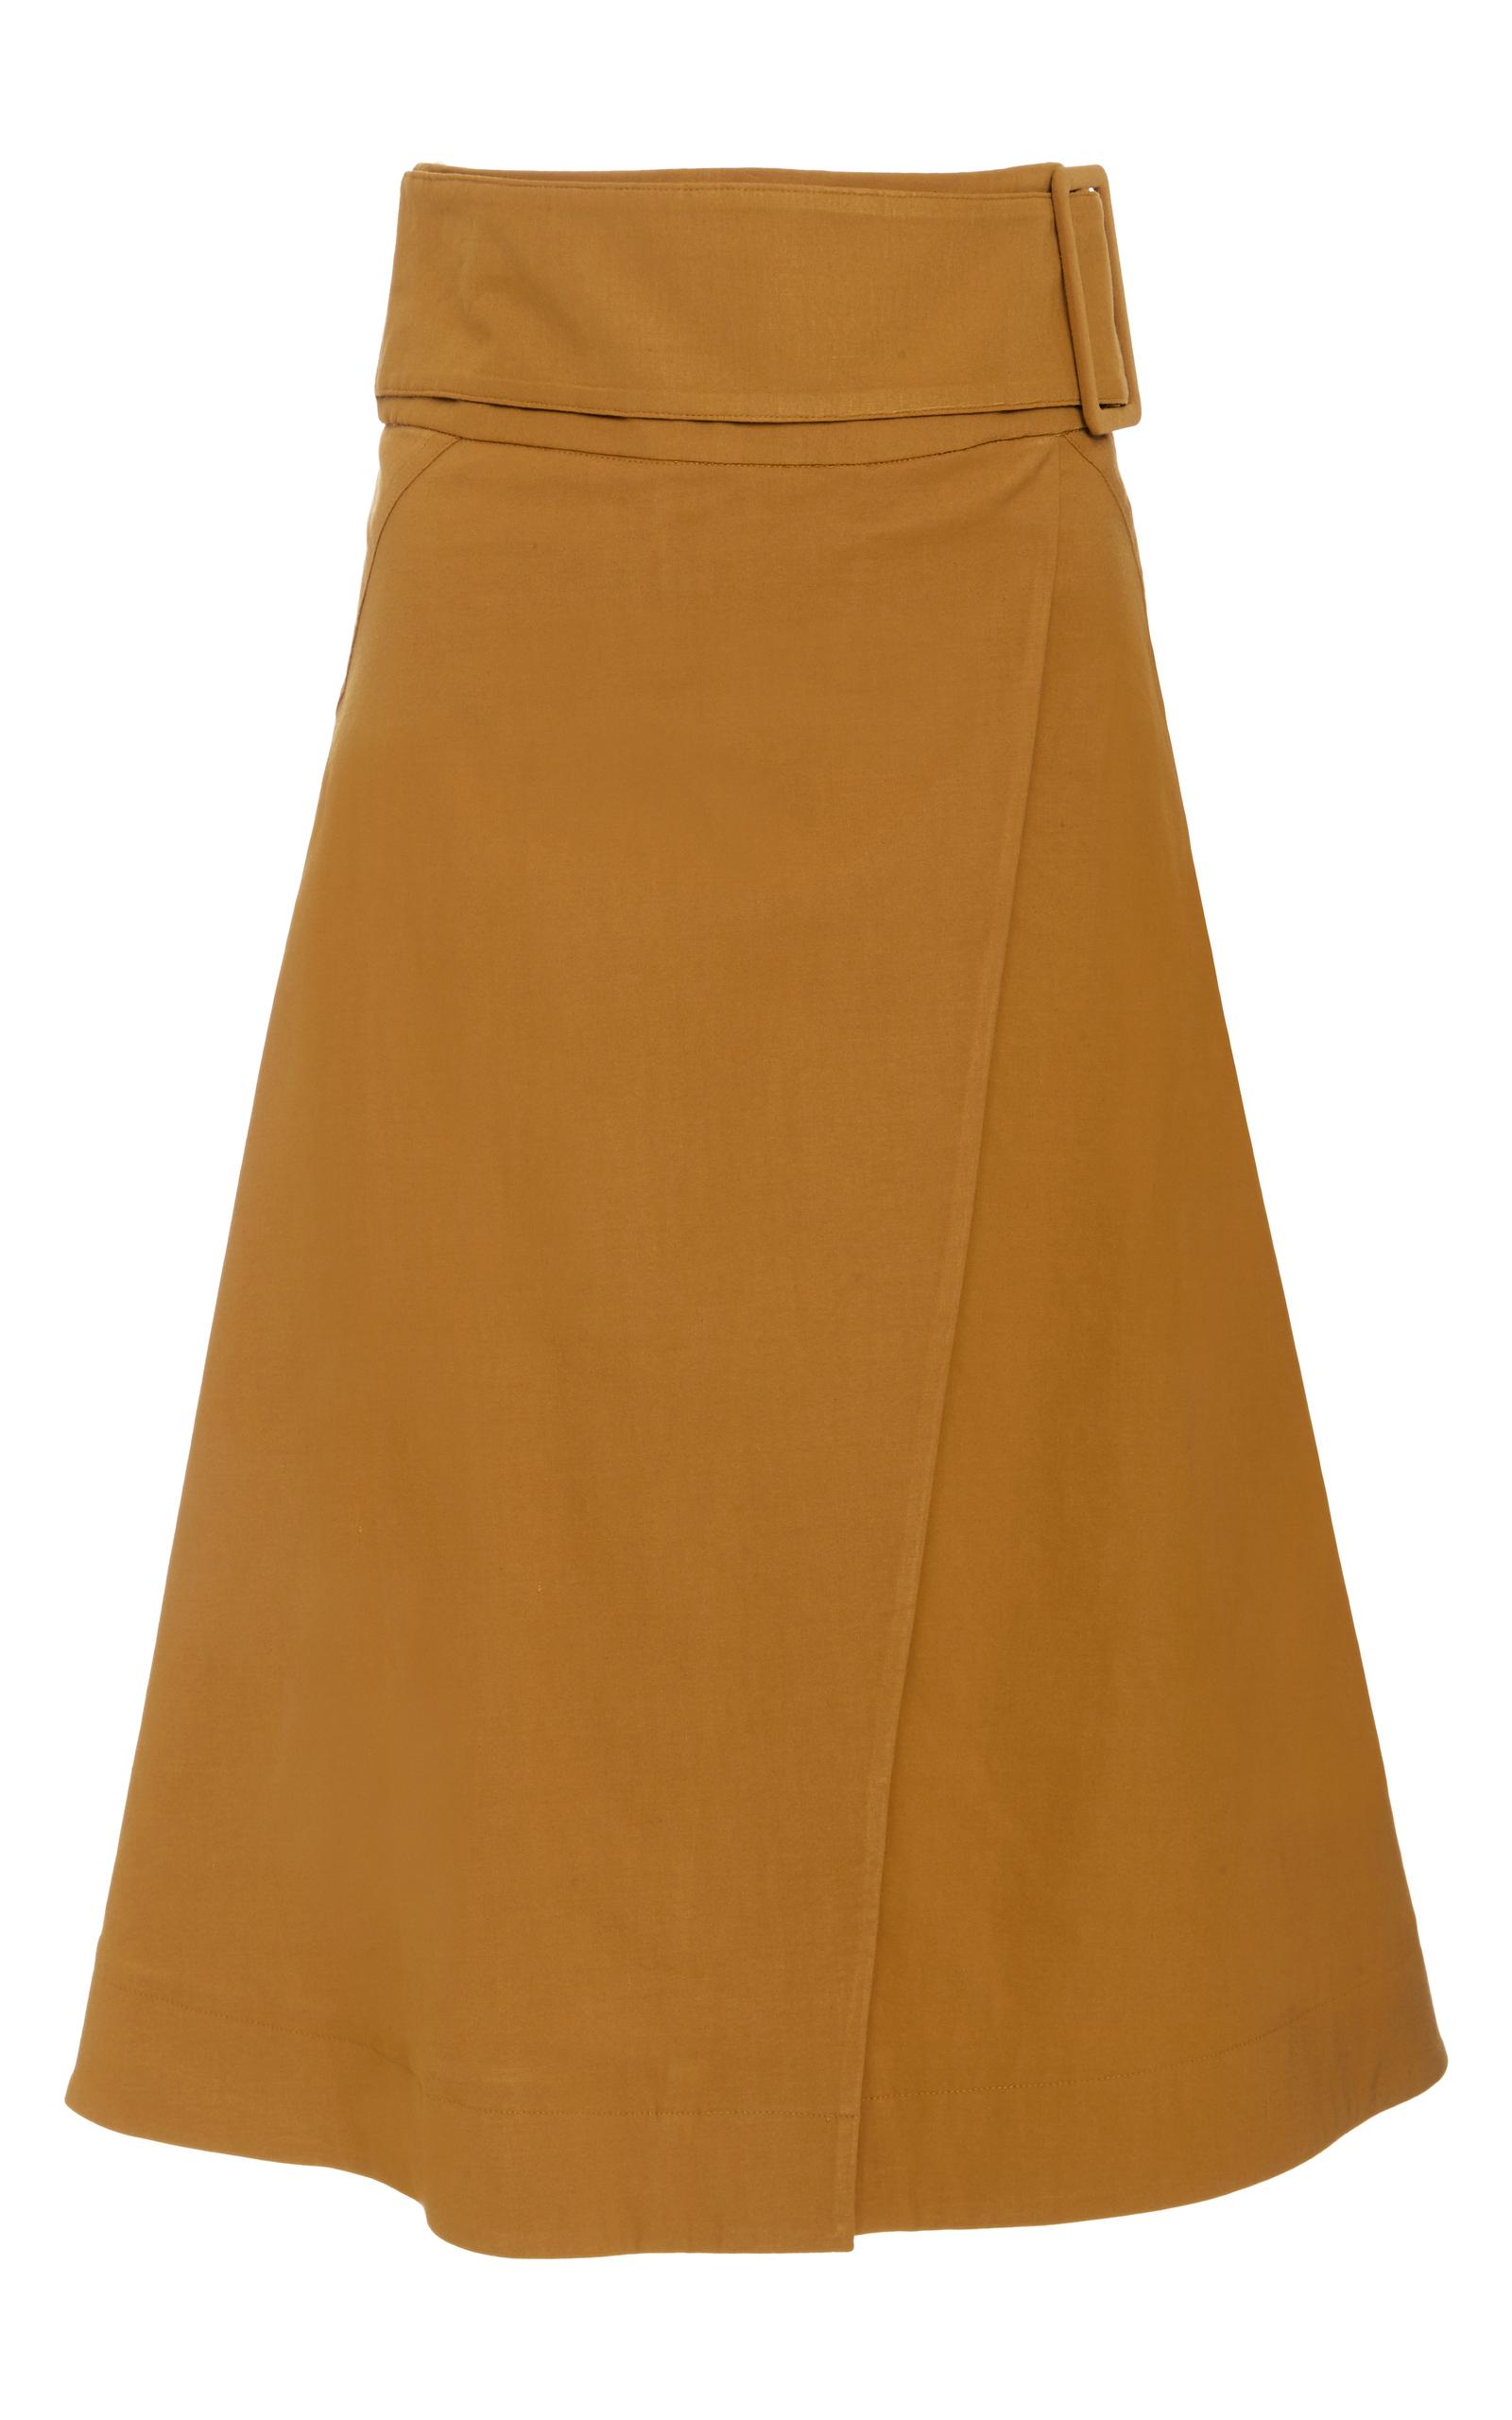 Belted A-line Wrap Skirt by Sea | Moda Operandi